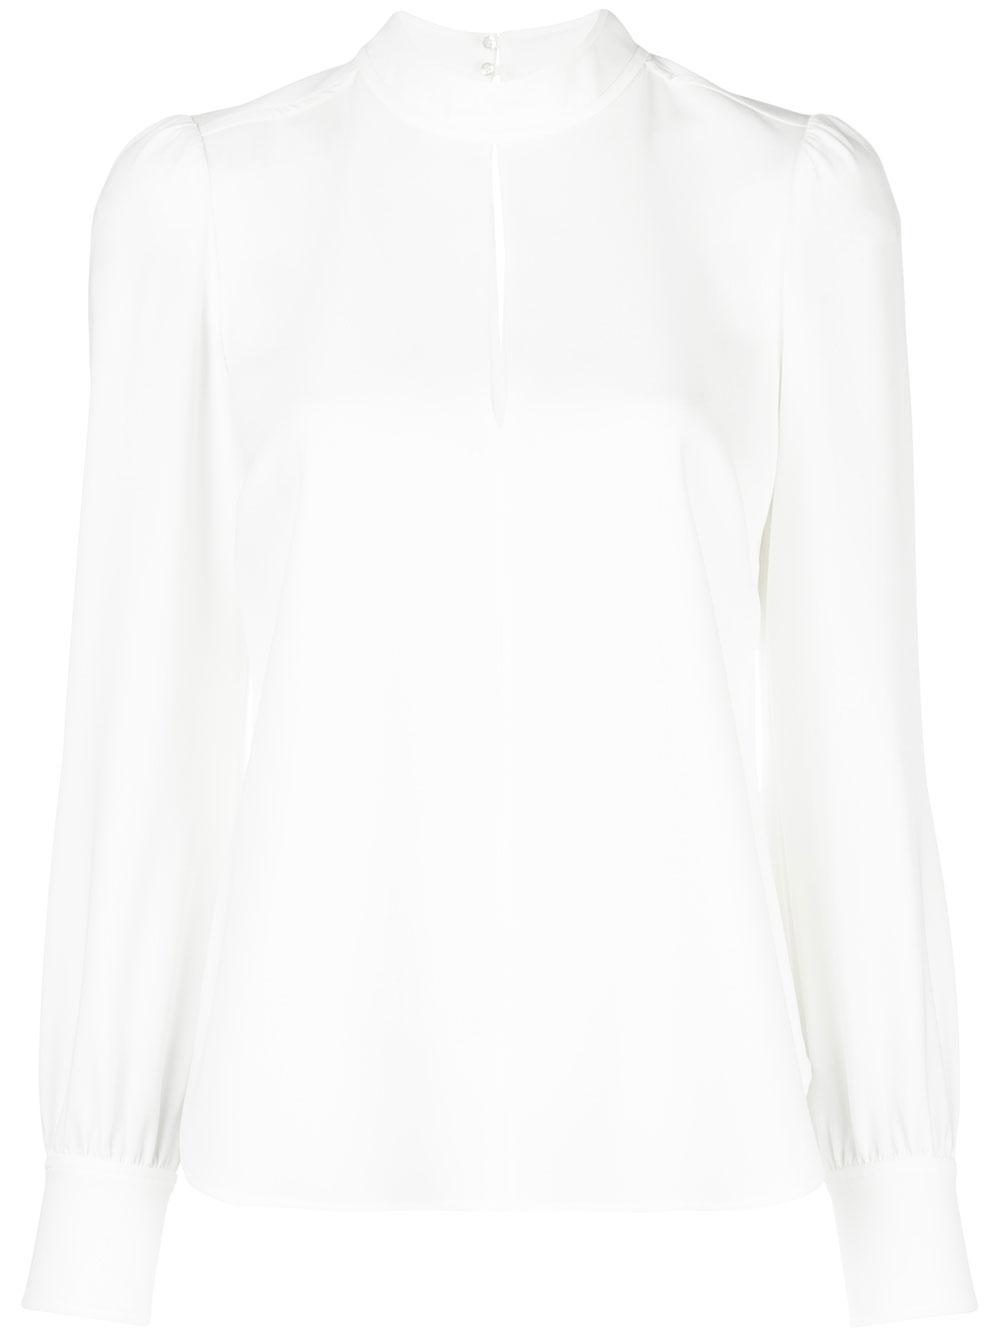 Marina Mock Neck Keyhole Long Sleeve Cuff Blouse Item # 5TOPS00634